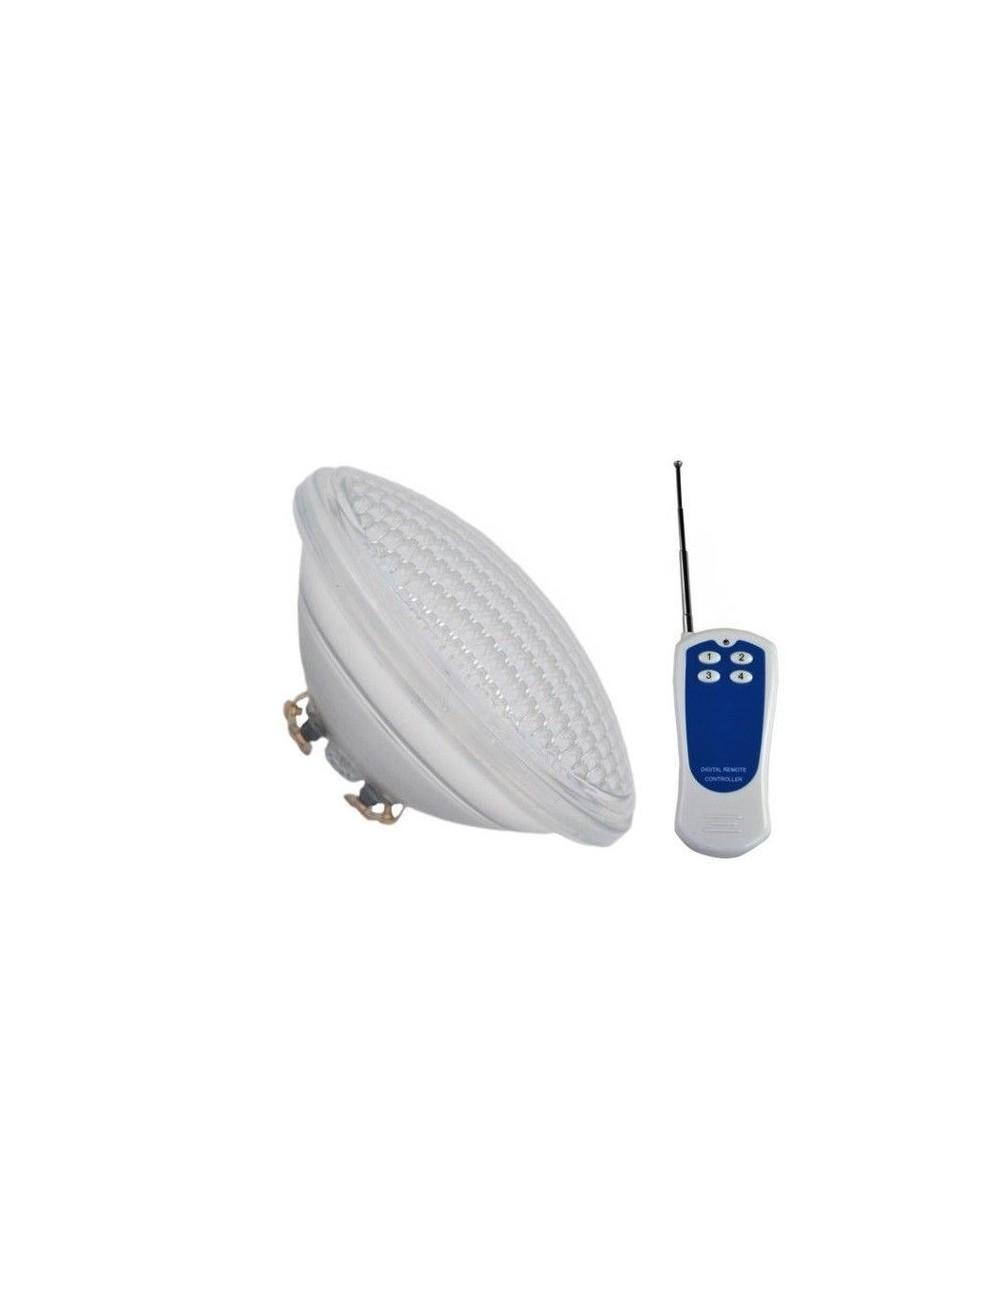 Lampada Led Con Telecomando.Lampada Led Da Piscina Rgb Par56 Ip68 8w 12v Con Telecomando V Tac